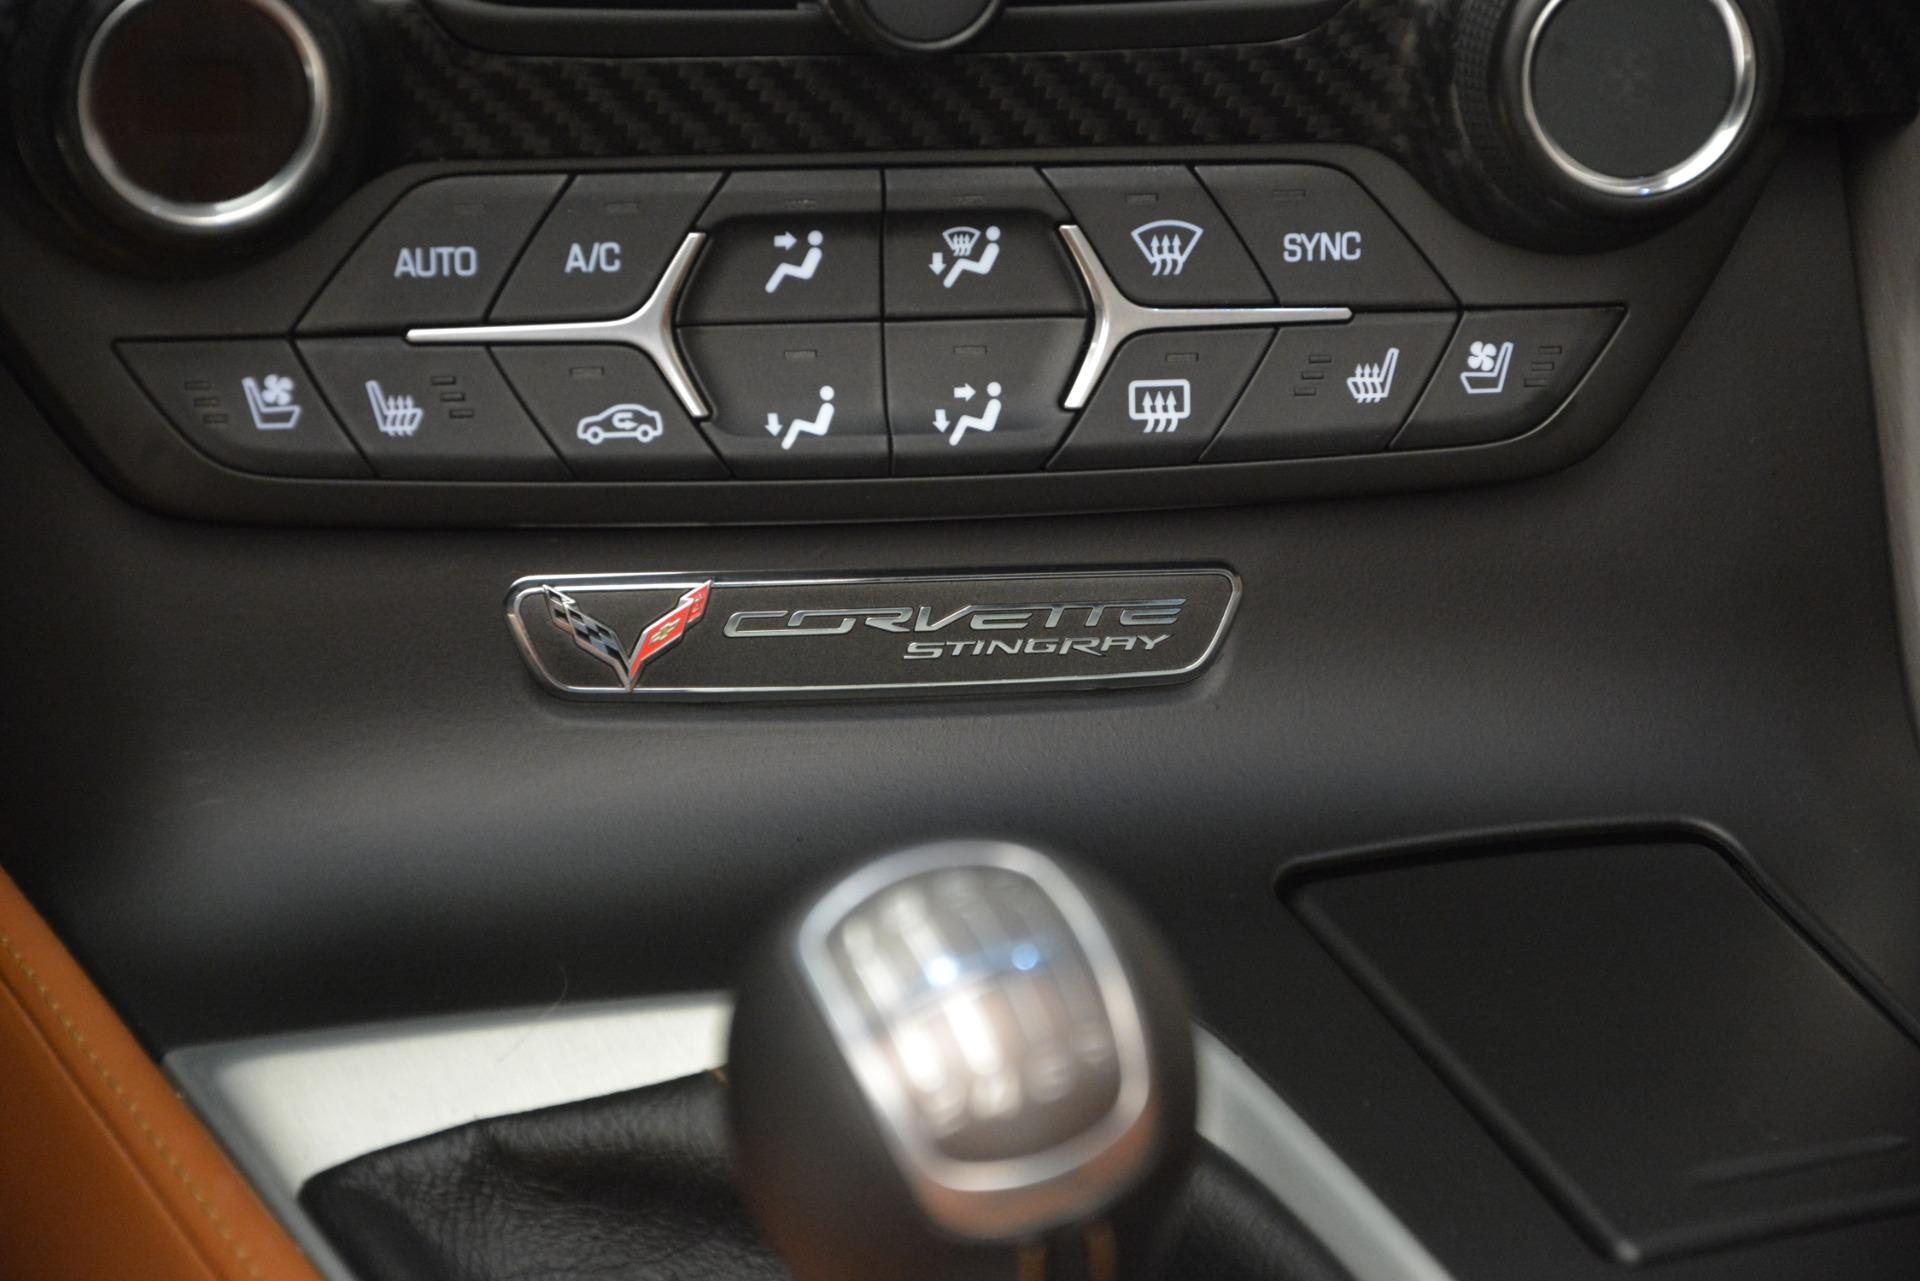 Used 2014 Chevrolet Corvette Stingray Z51 For Sale In Greenwich, CT 2703_p23